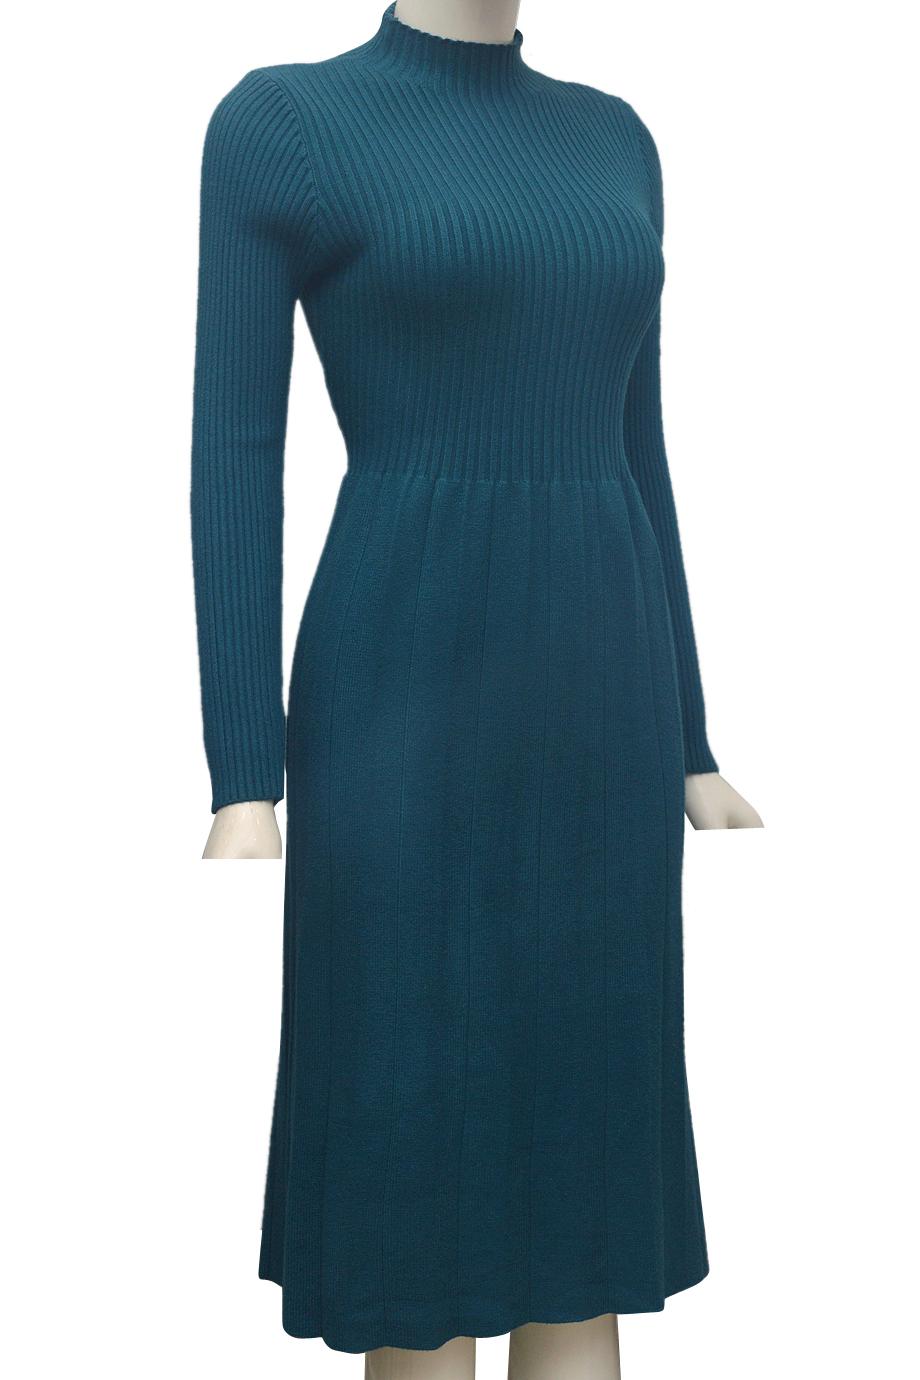 Váy len cặp thời trang ELMI cao cấp màu xanh EV46-3